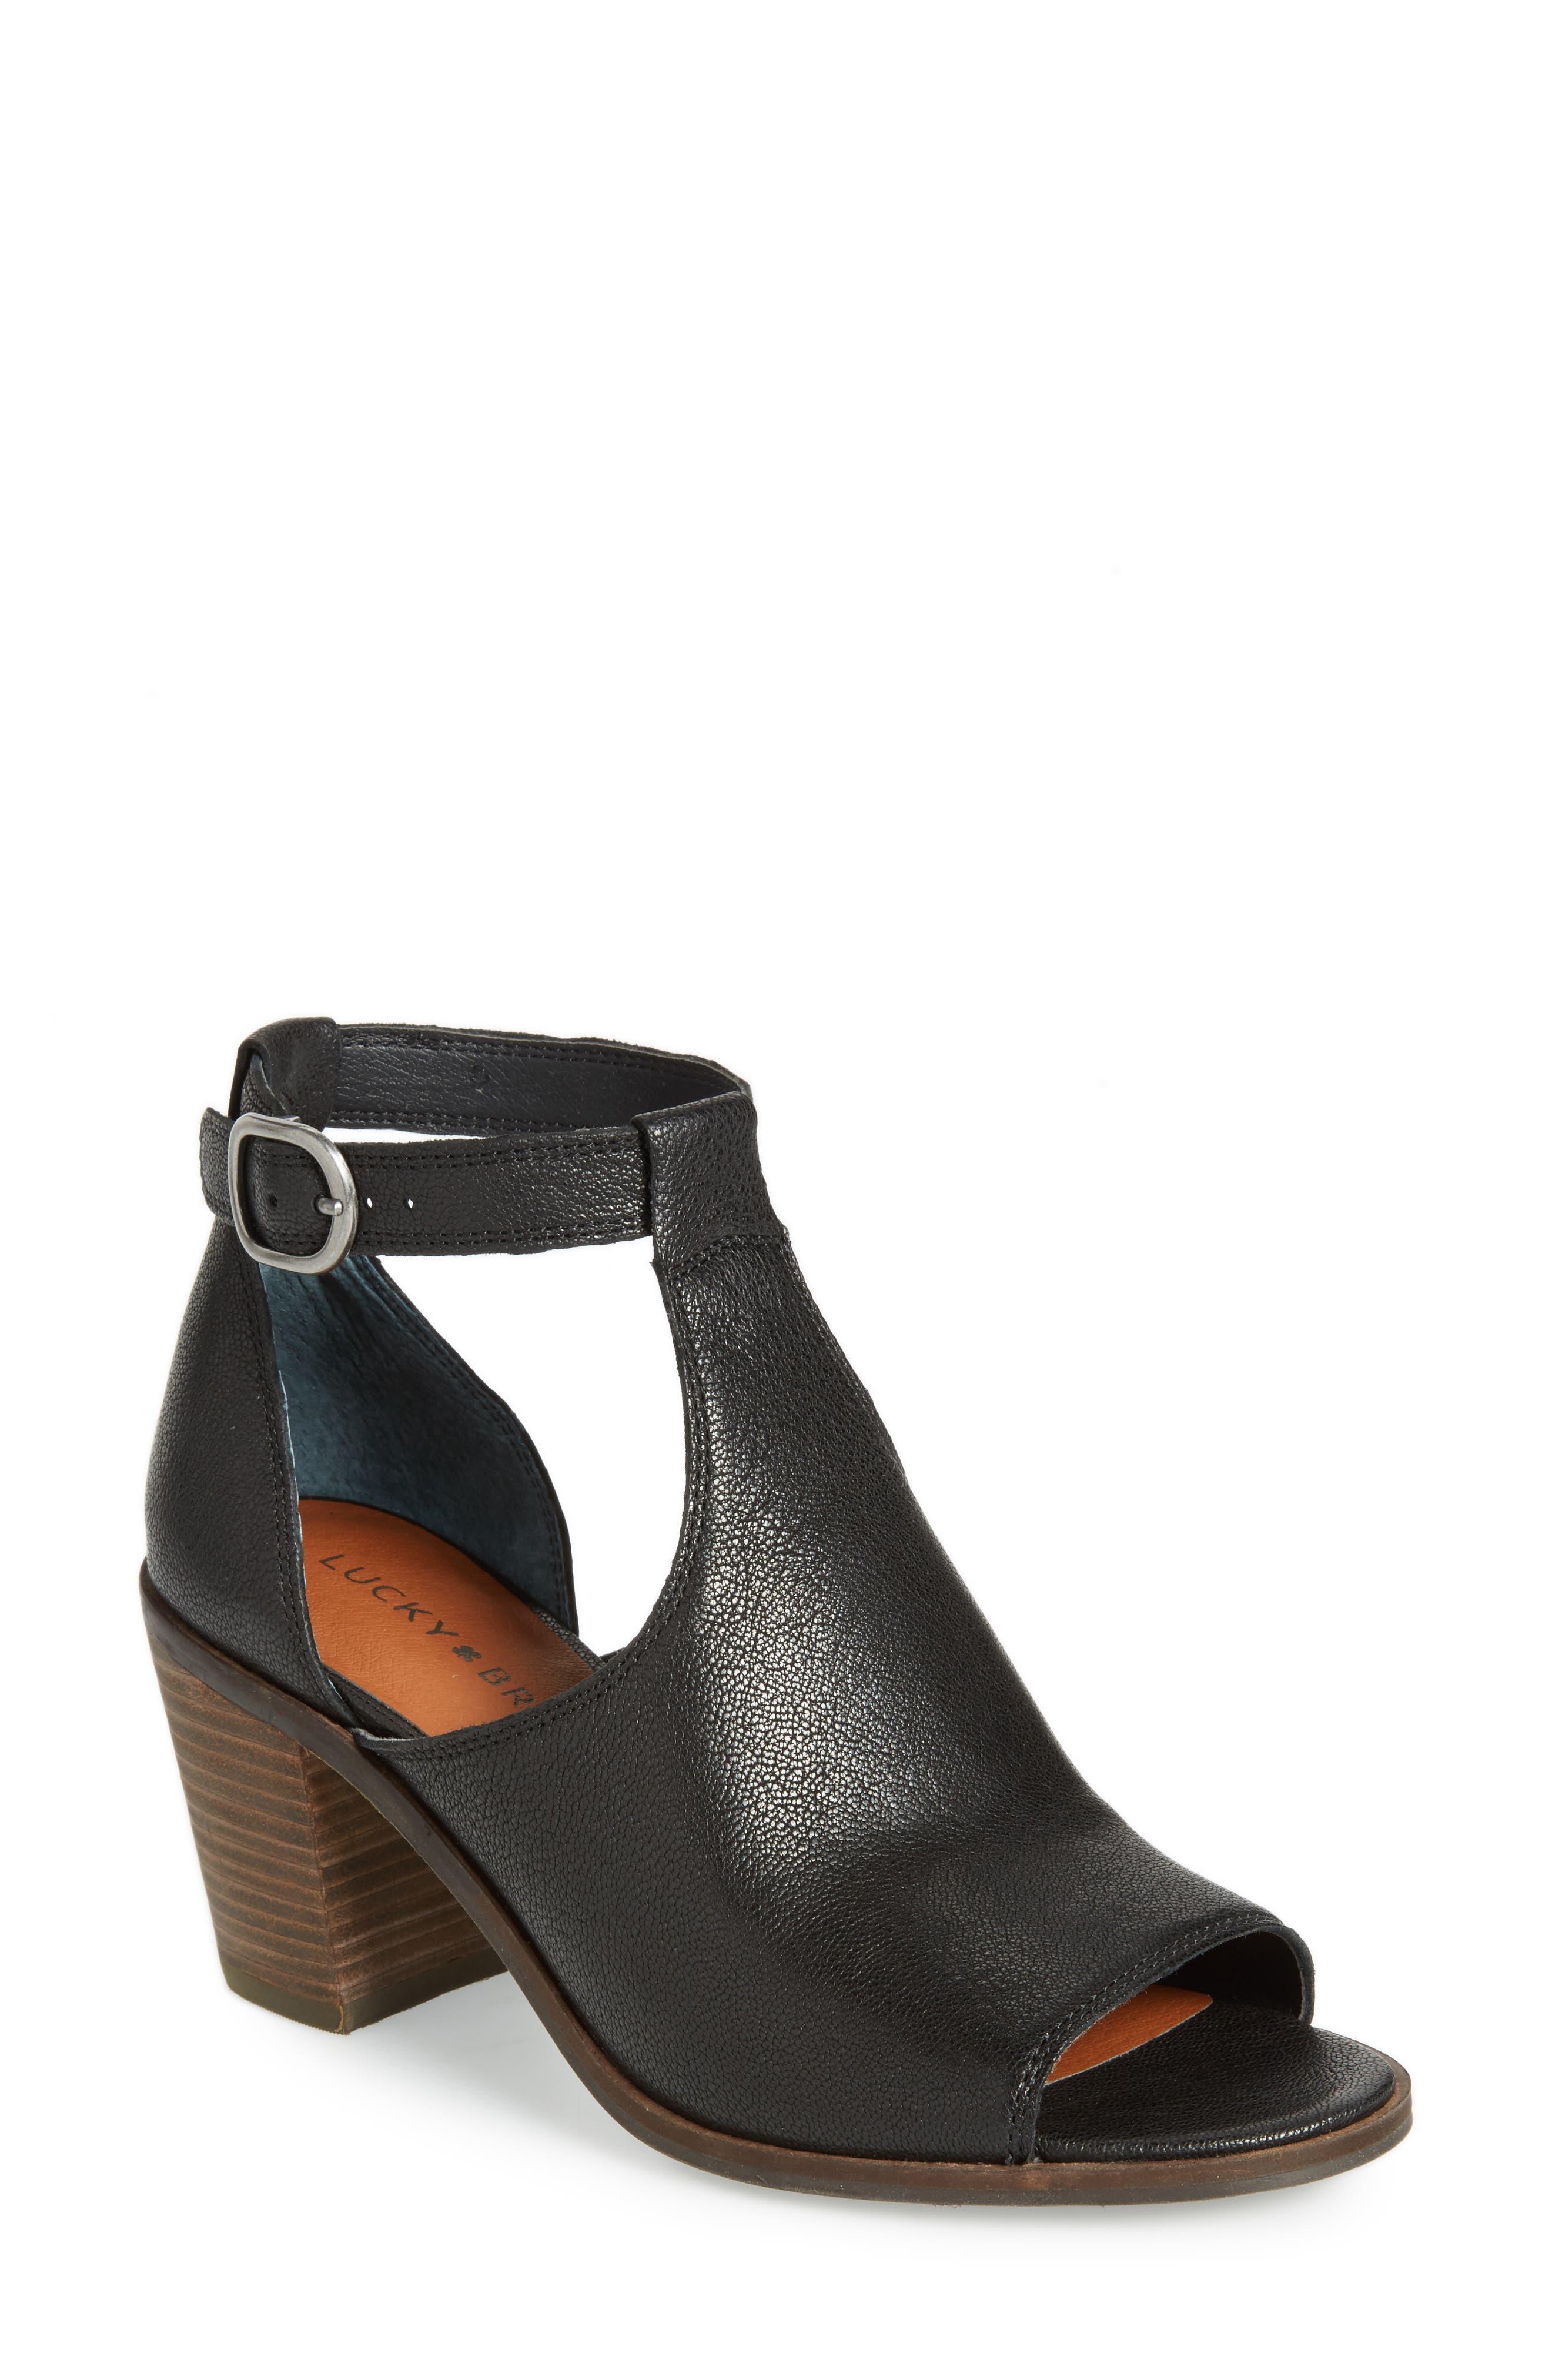 Kadian Block Heel Sandal,                             Main thumbnail 1, color,                             Black Leather